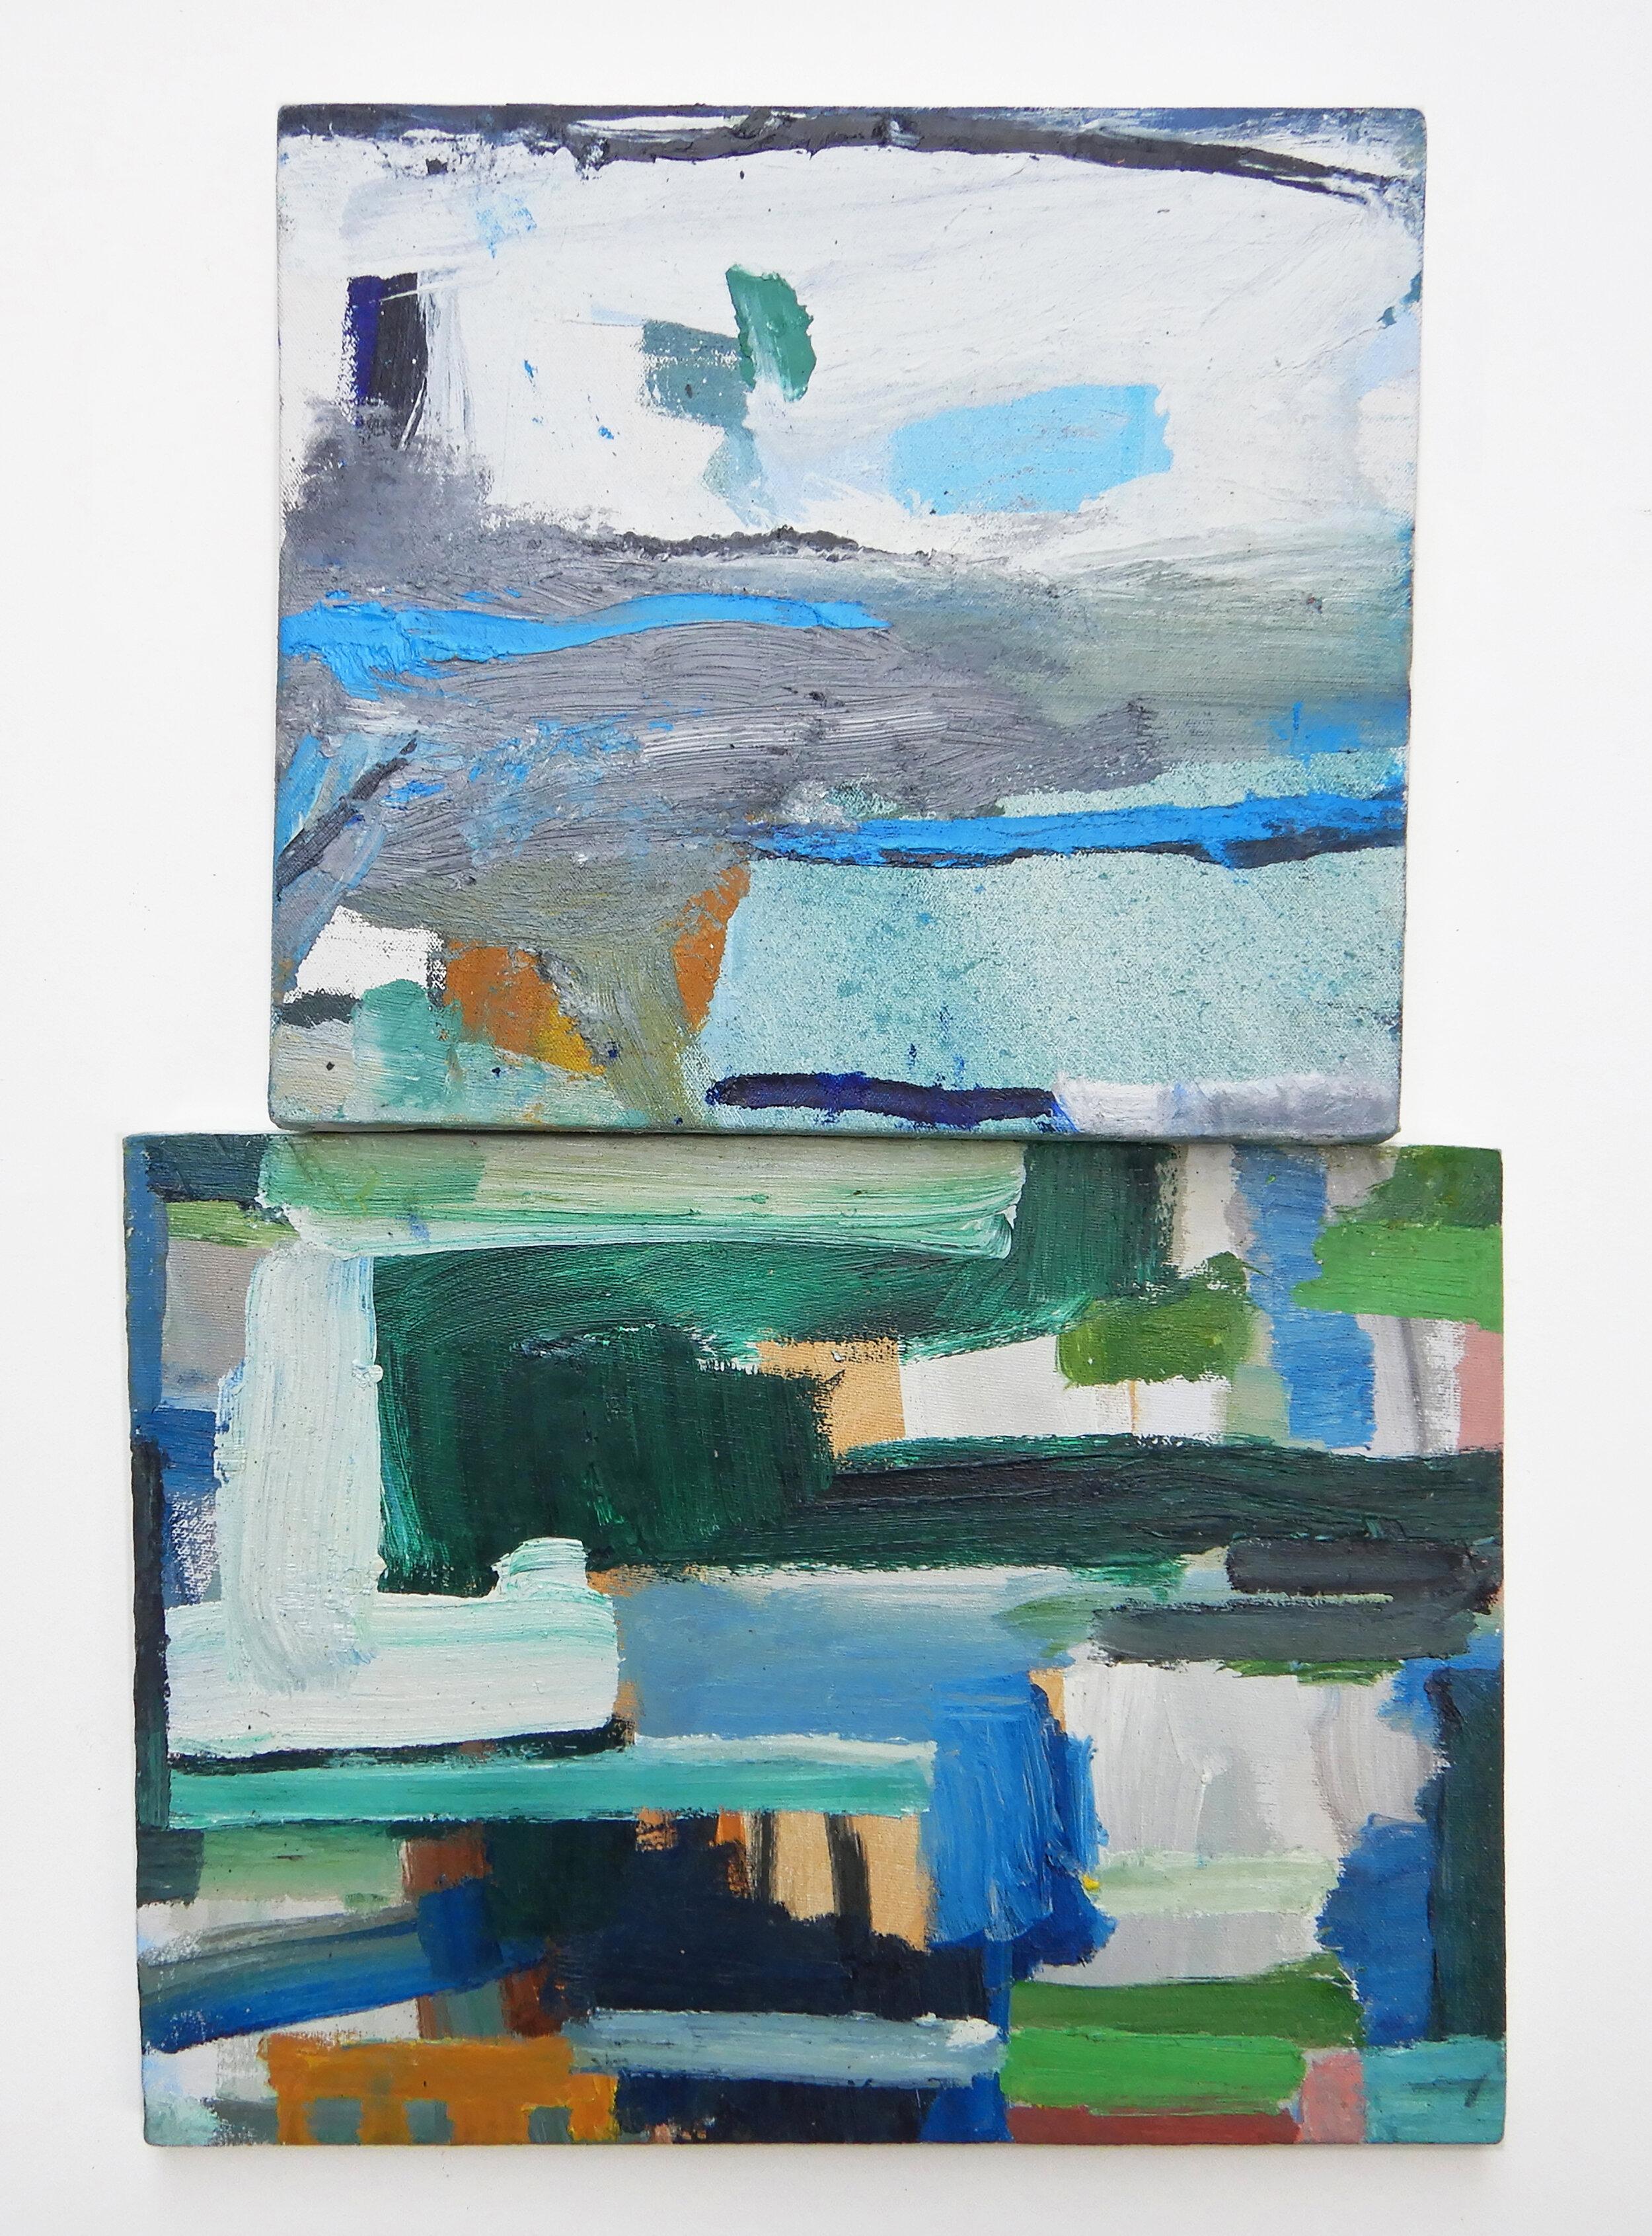 small painting oil on canvas on wood #17.jpg